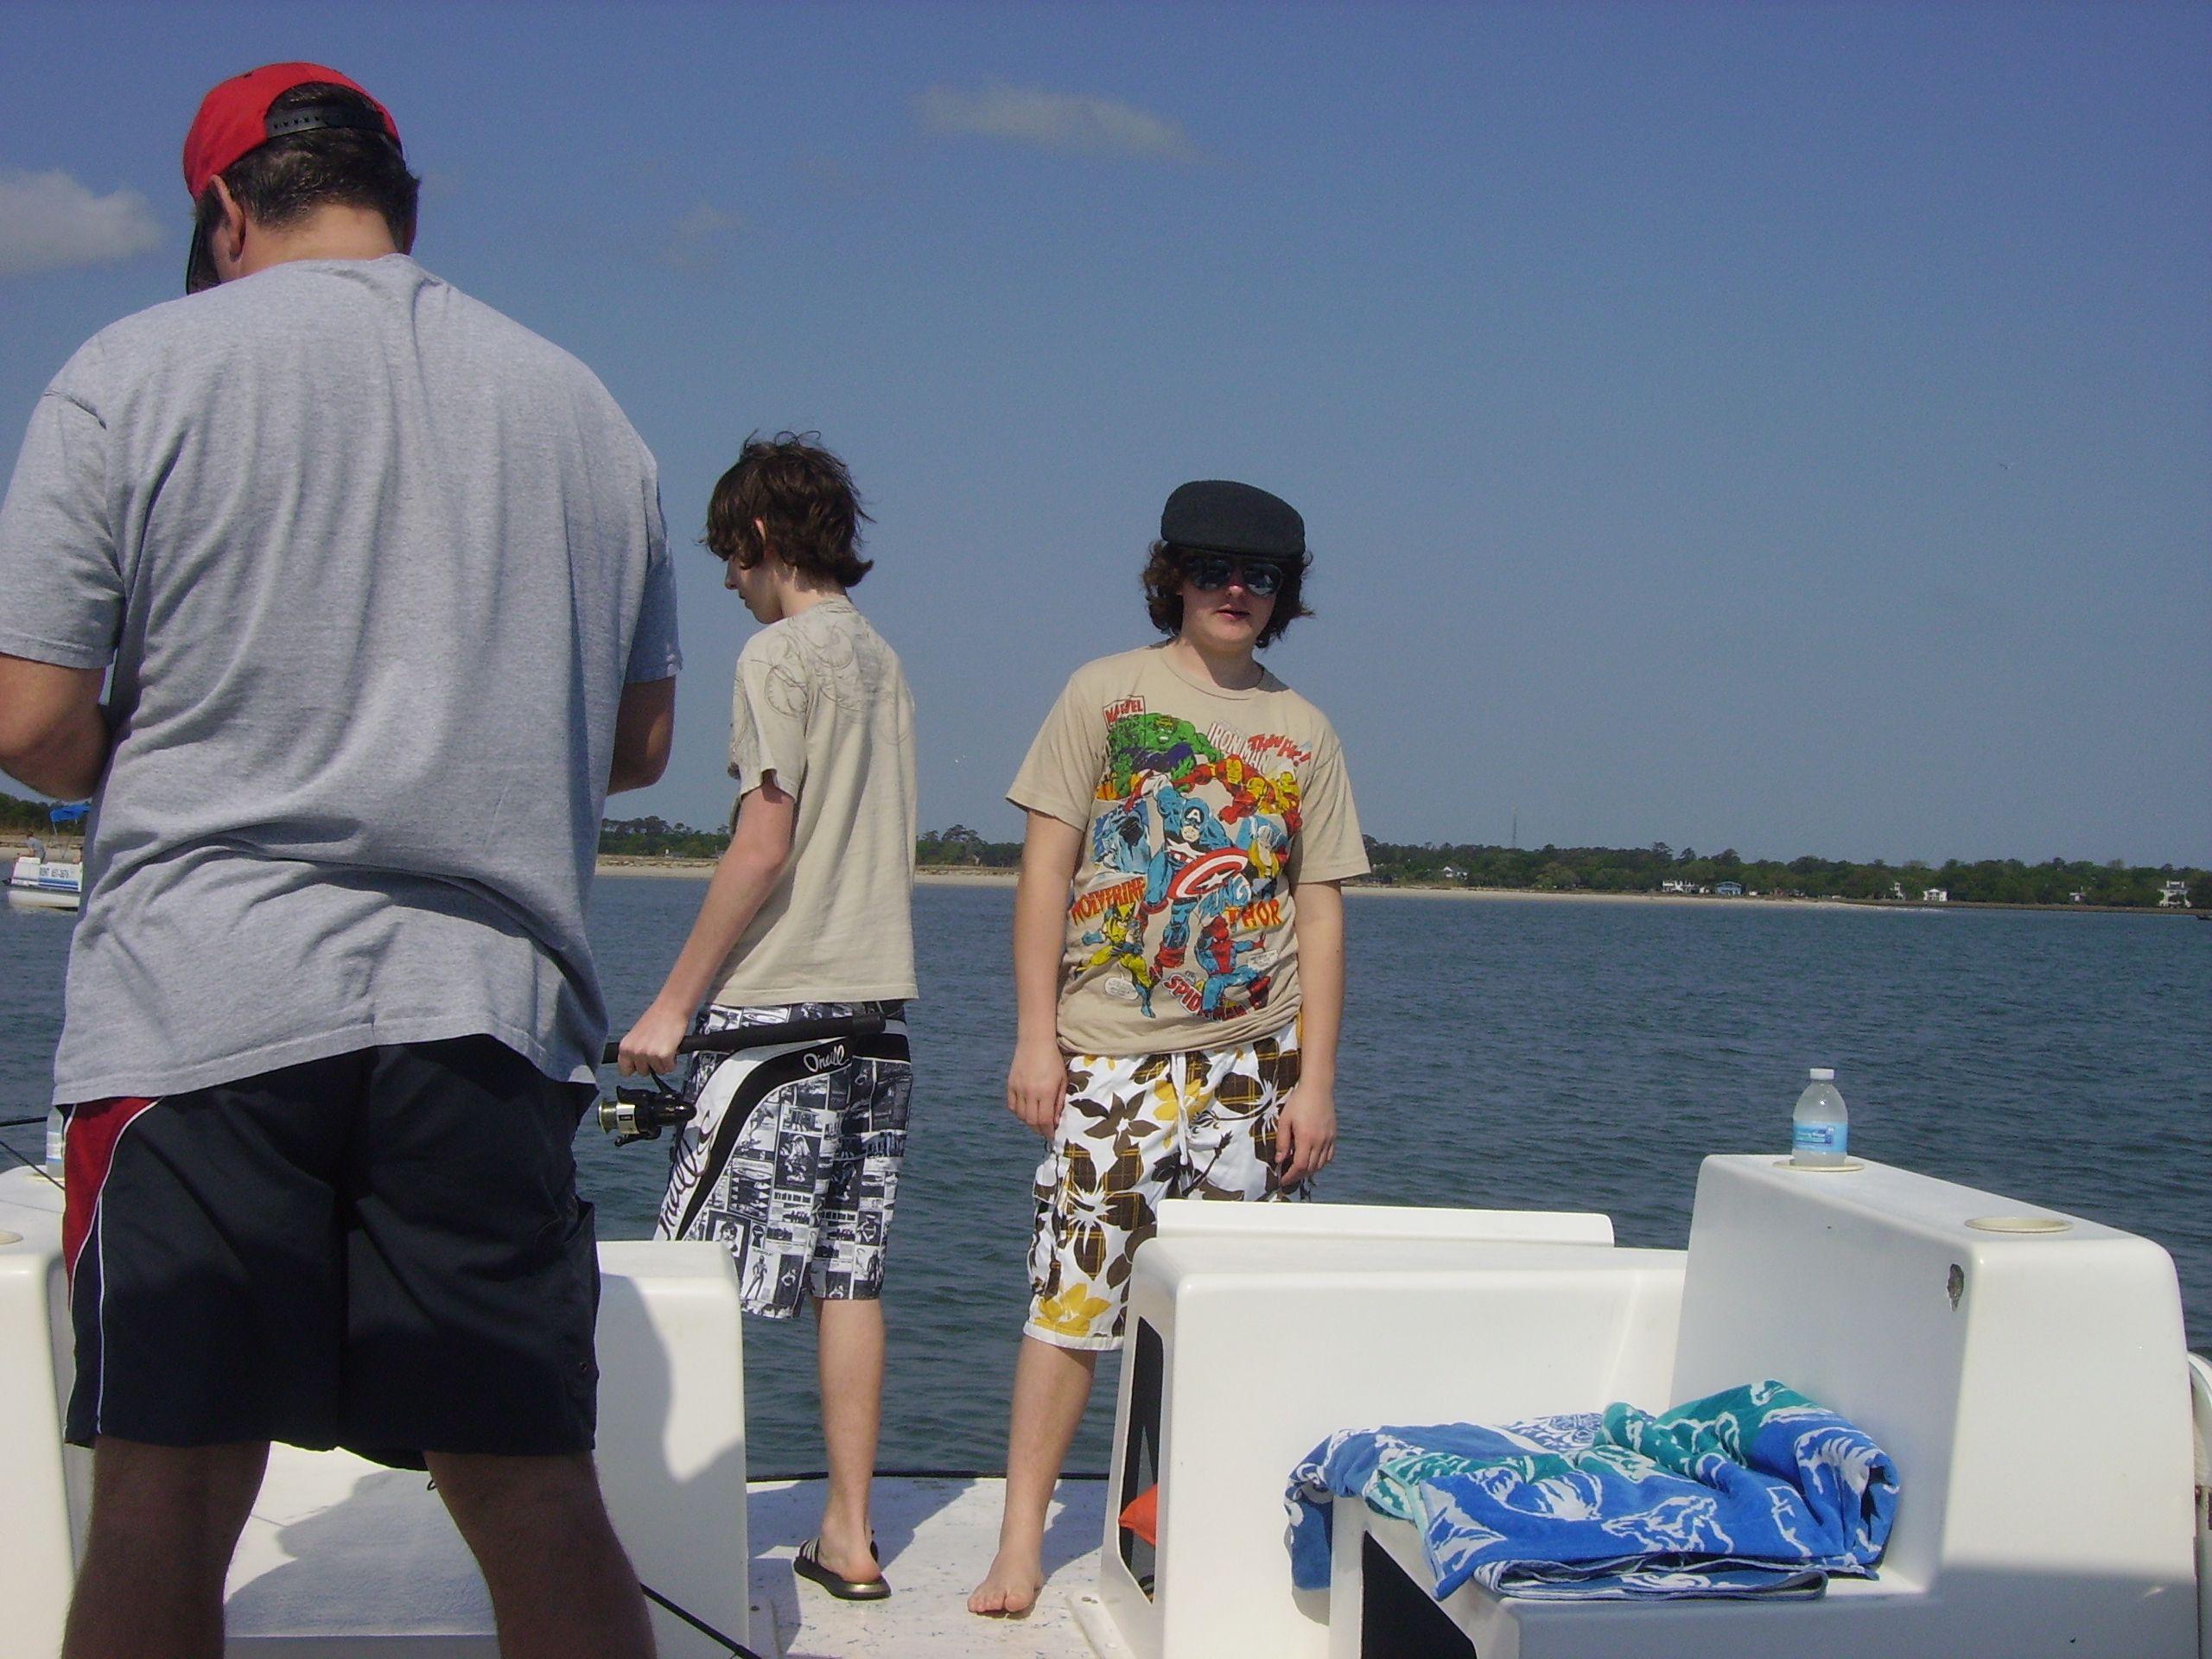 Family fun on the ocean